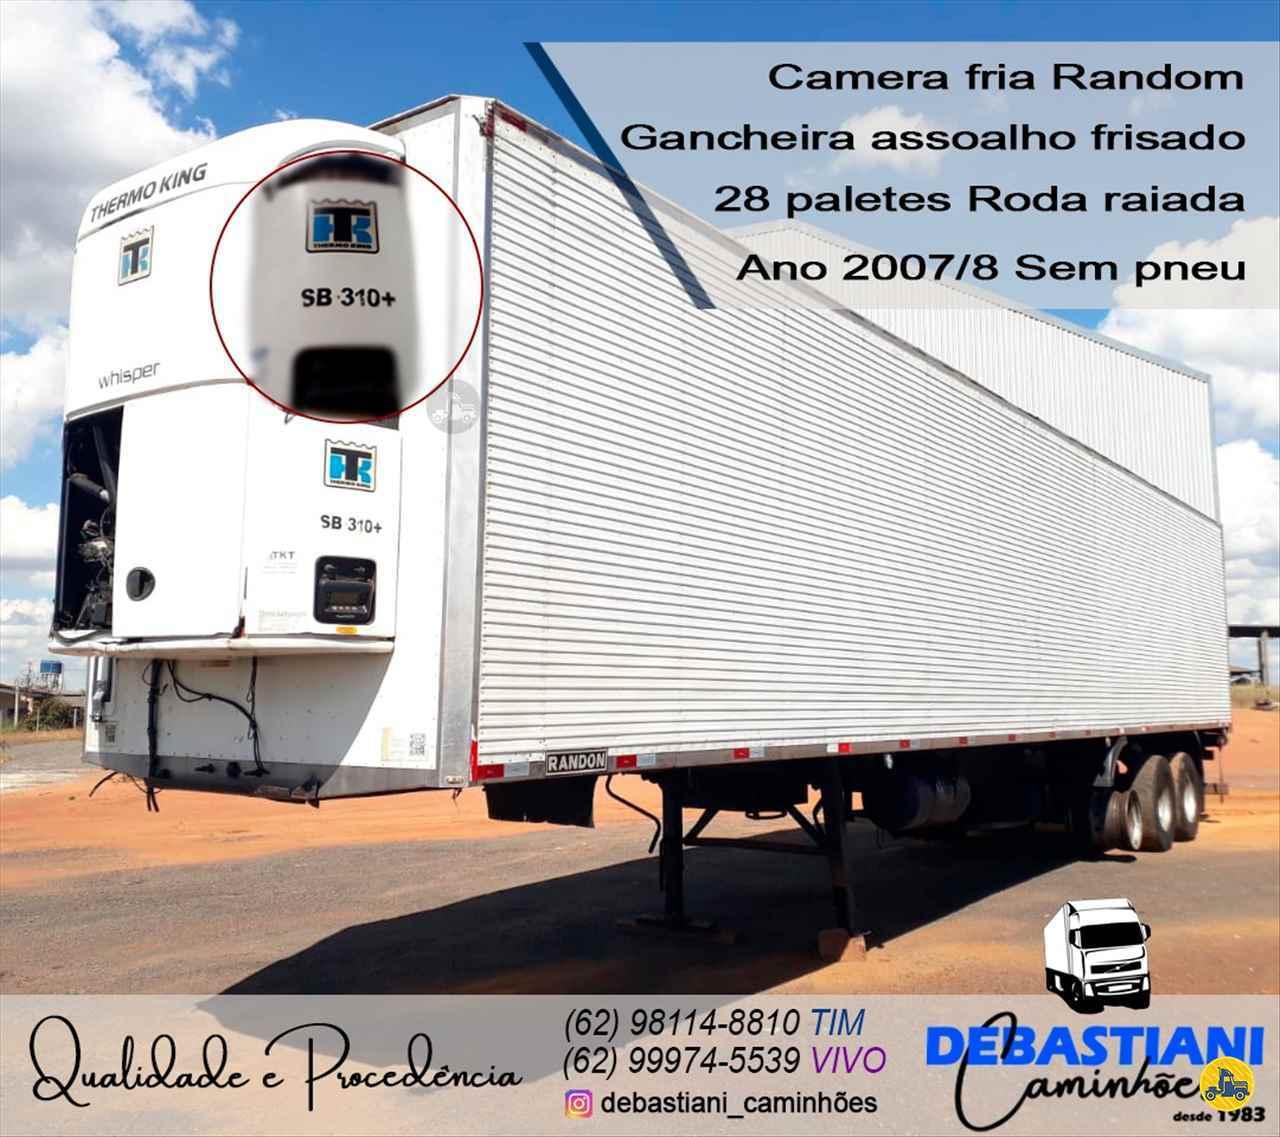 CARRETA SEMI-REBOQUE FRIGORIFICO Debastiani Caminhões ANAPOLIS GOIAS GO